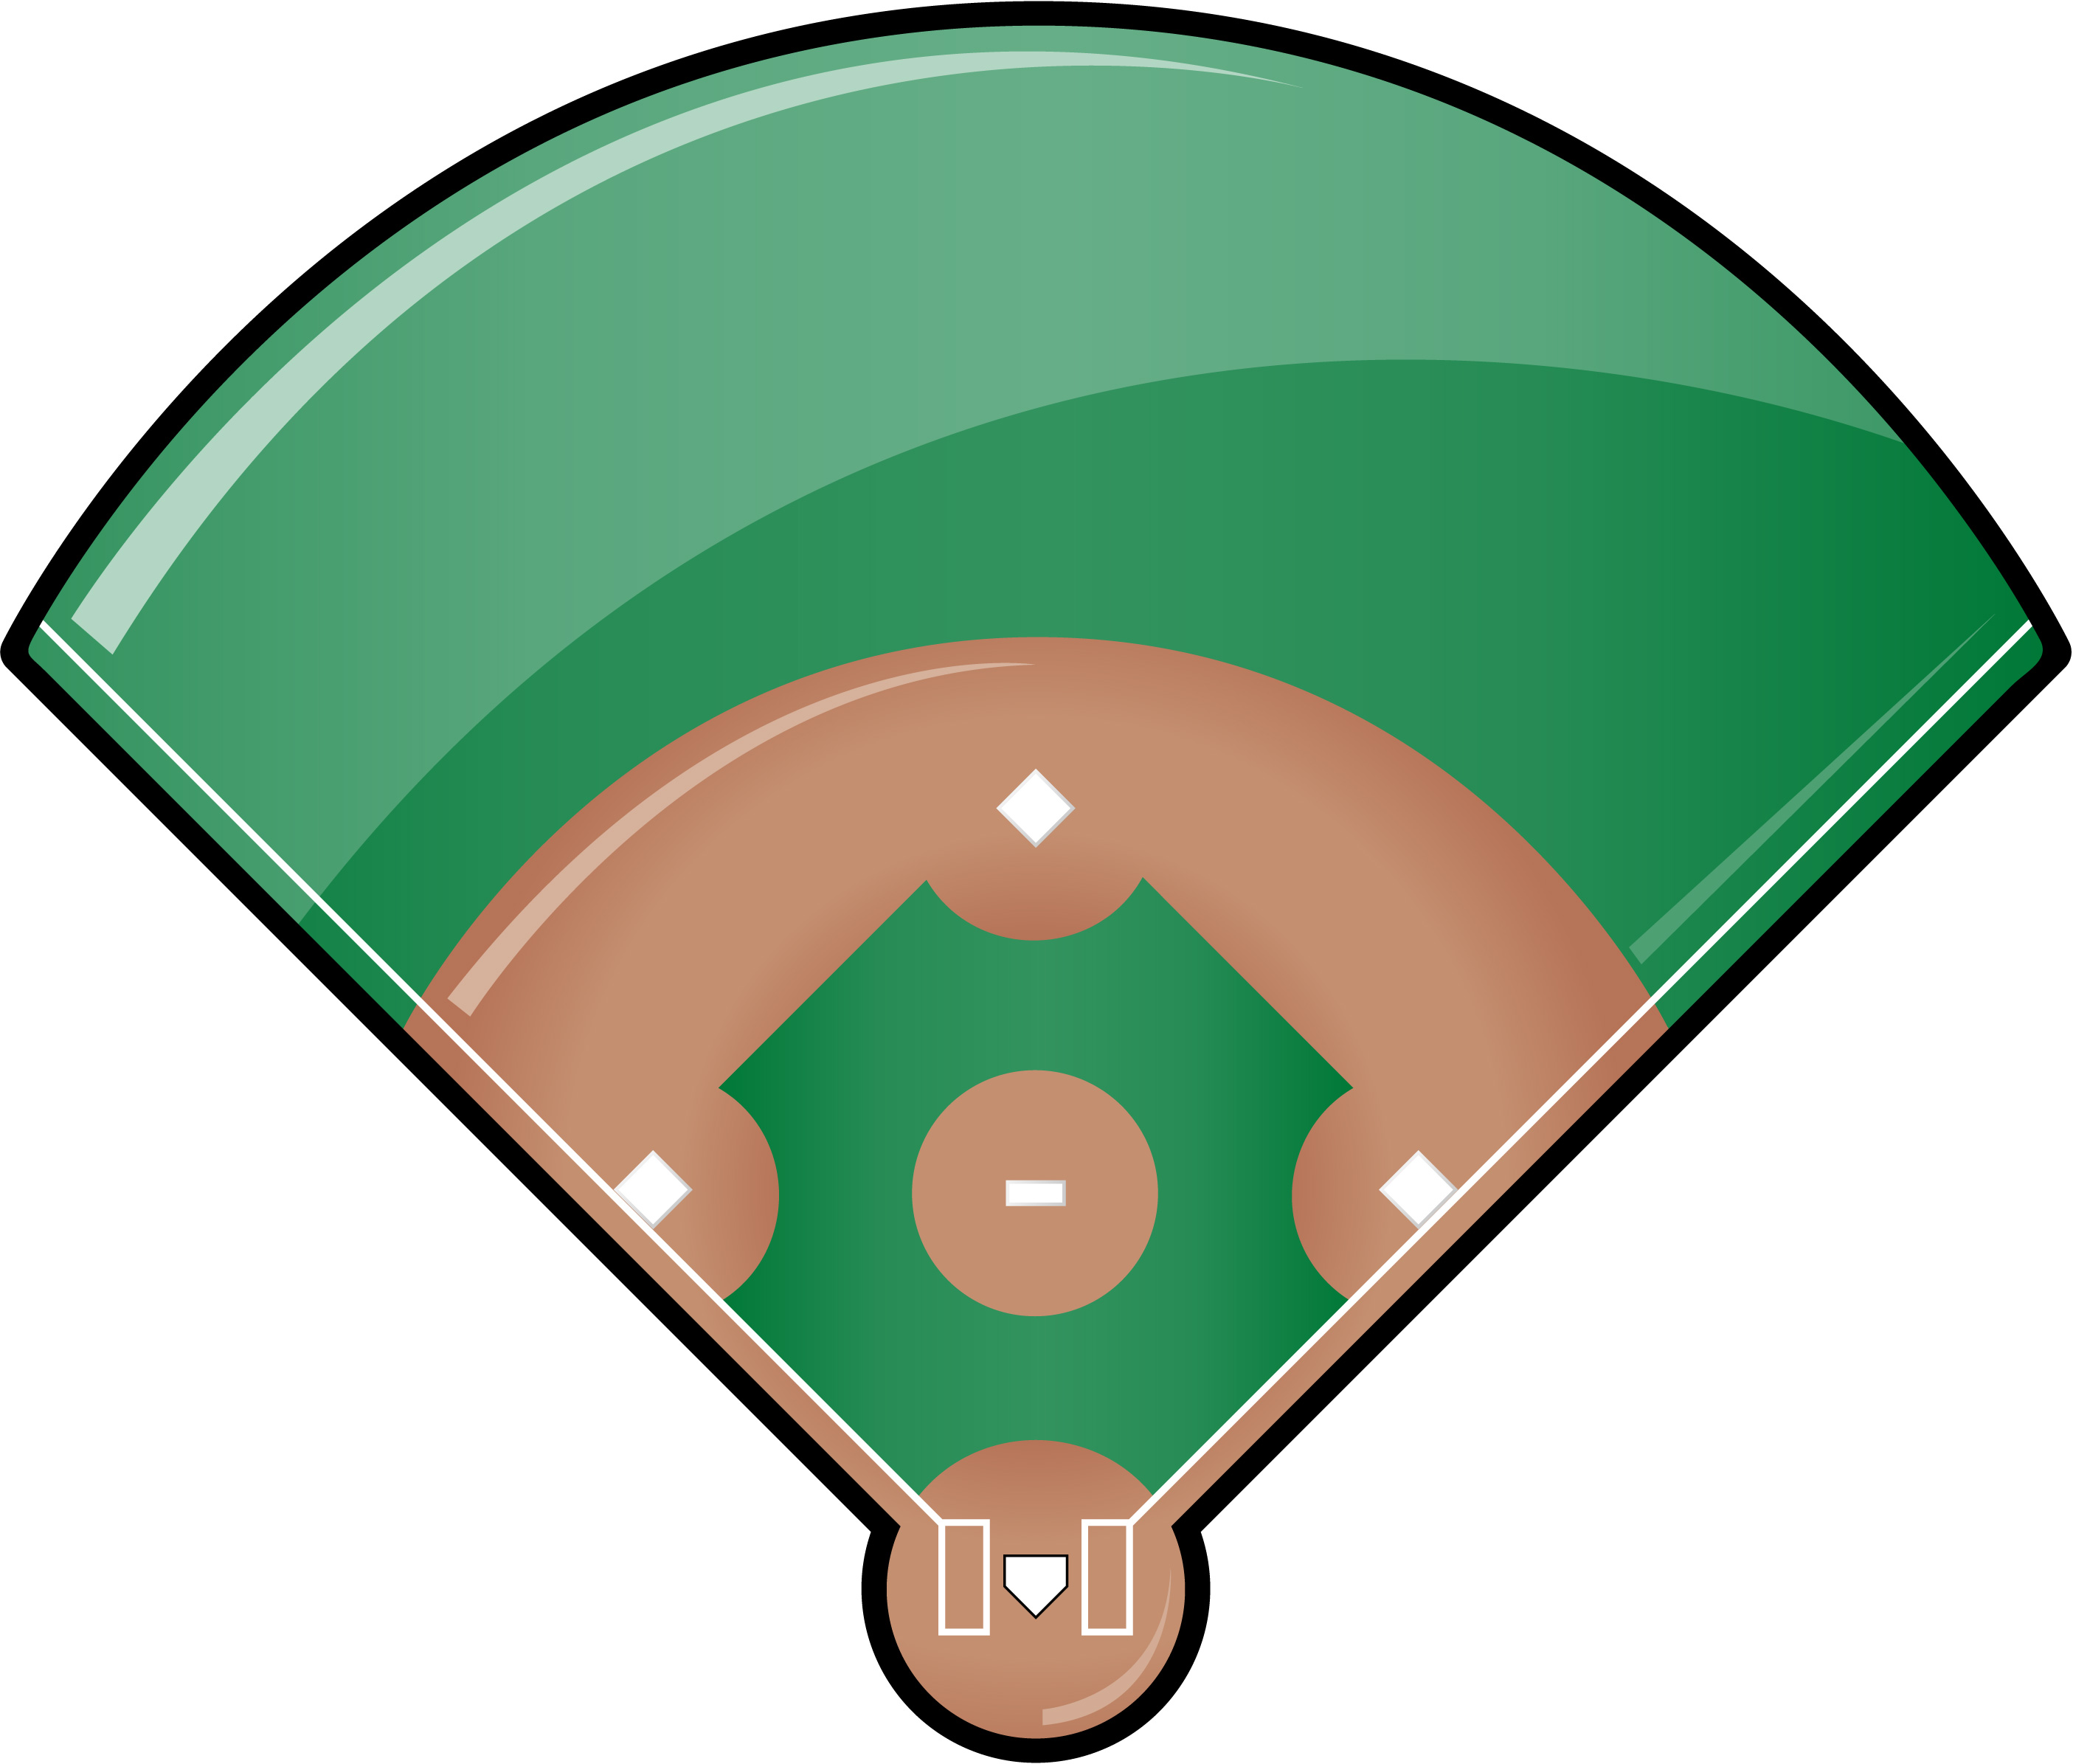 Baseball Field Clipart-baseball field clipart-2